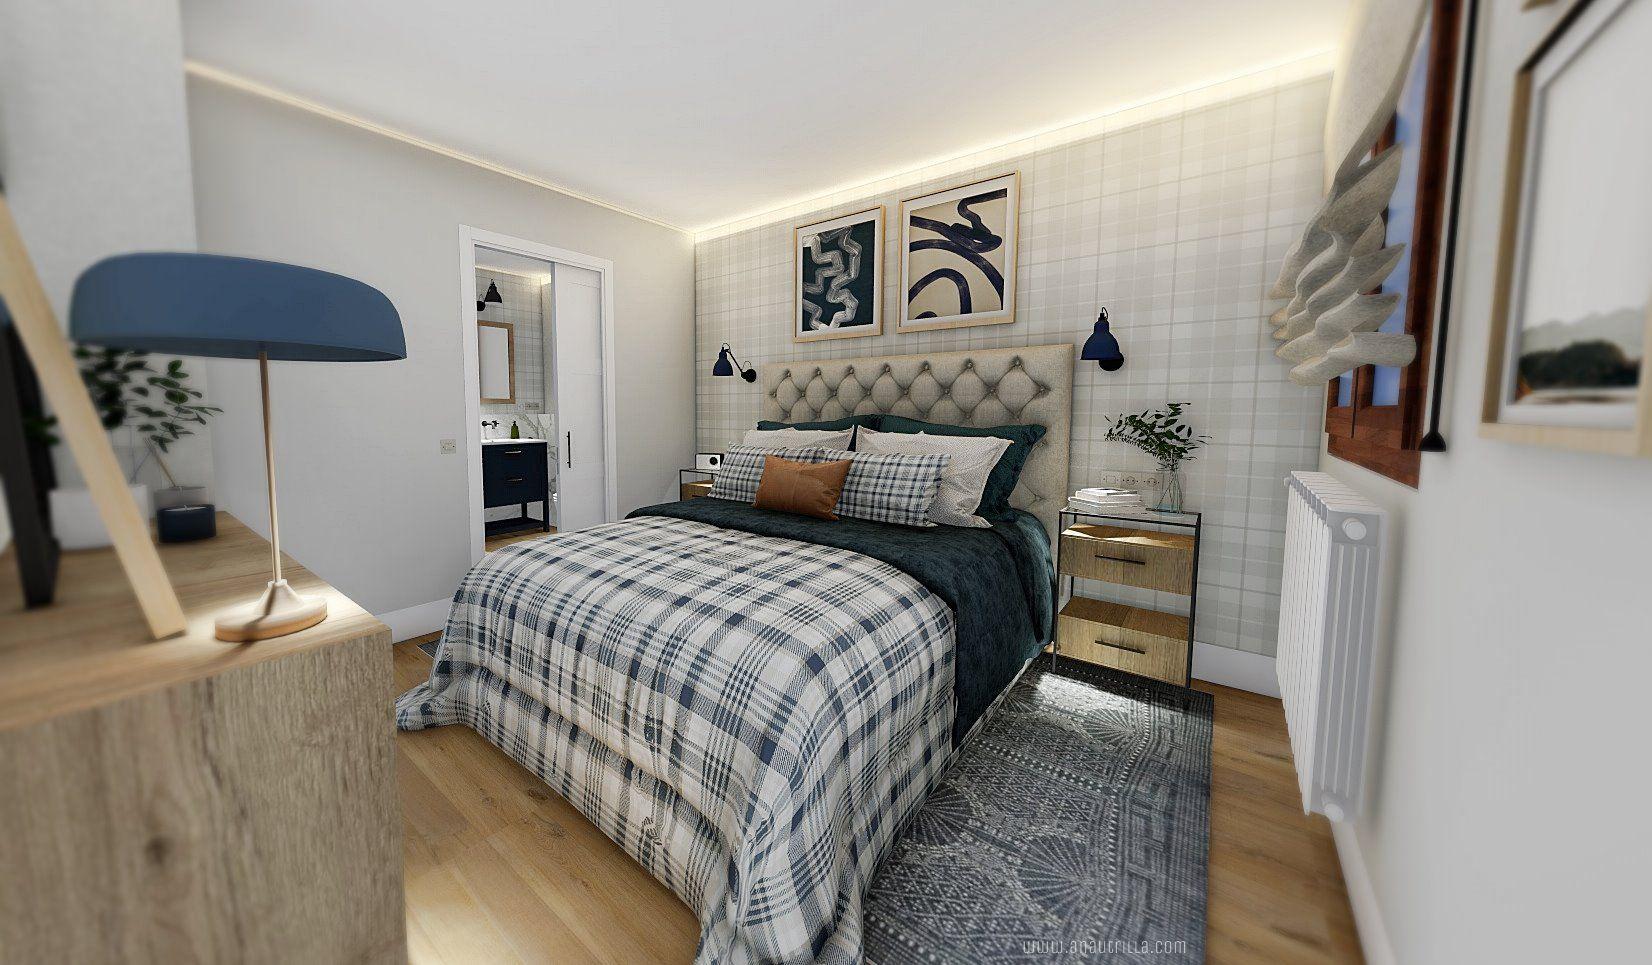 Habitación principal en tonos azules, de estilo gentleman proyecto de diseño e interiorismo 3D, reforma integral en Valladolid #AnaUtrillaInteriorismo @Utrillanais